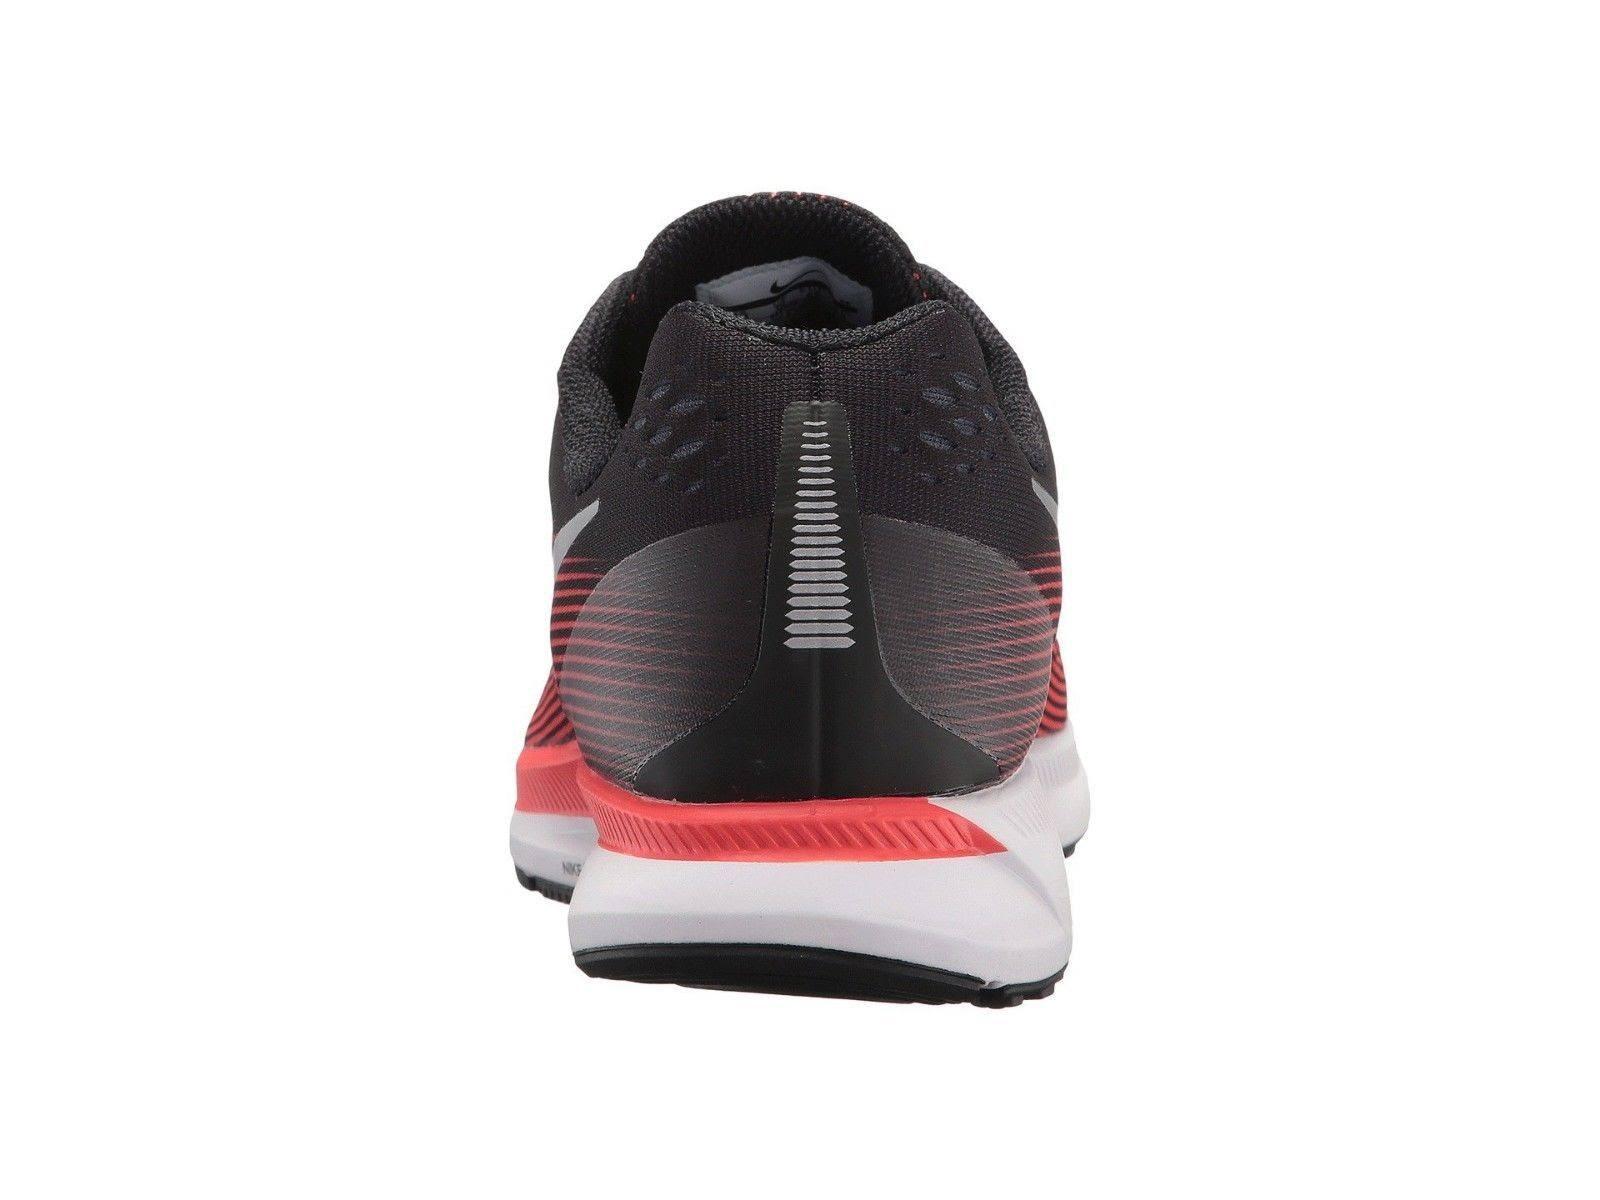 Zoom Tamaño Plateado Zapatillas Correr Nike Negro 34 880555006 Metálico Para 14 Air Pegasus Hombre gzwBqxa5